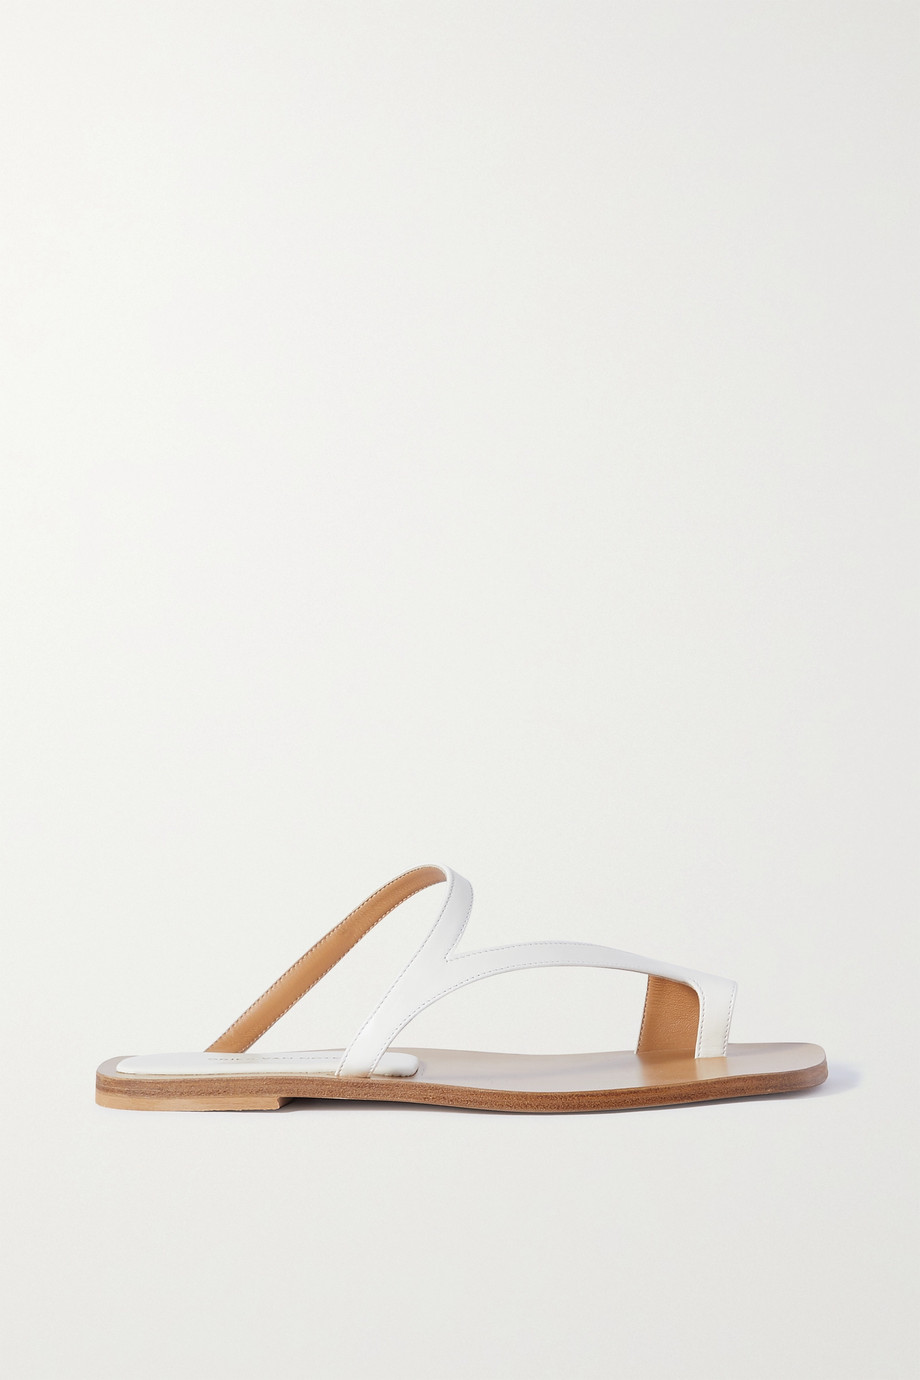 Dries Van Noten Donna leather sandals